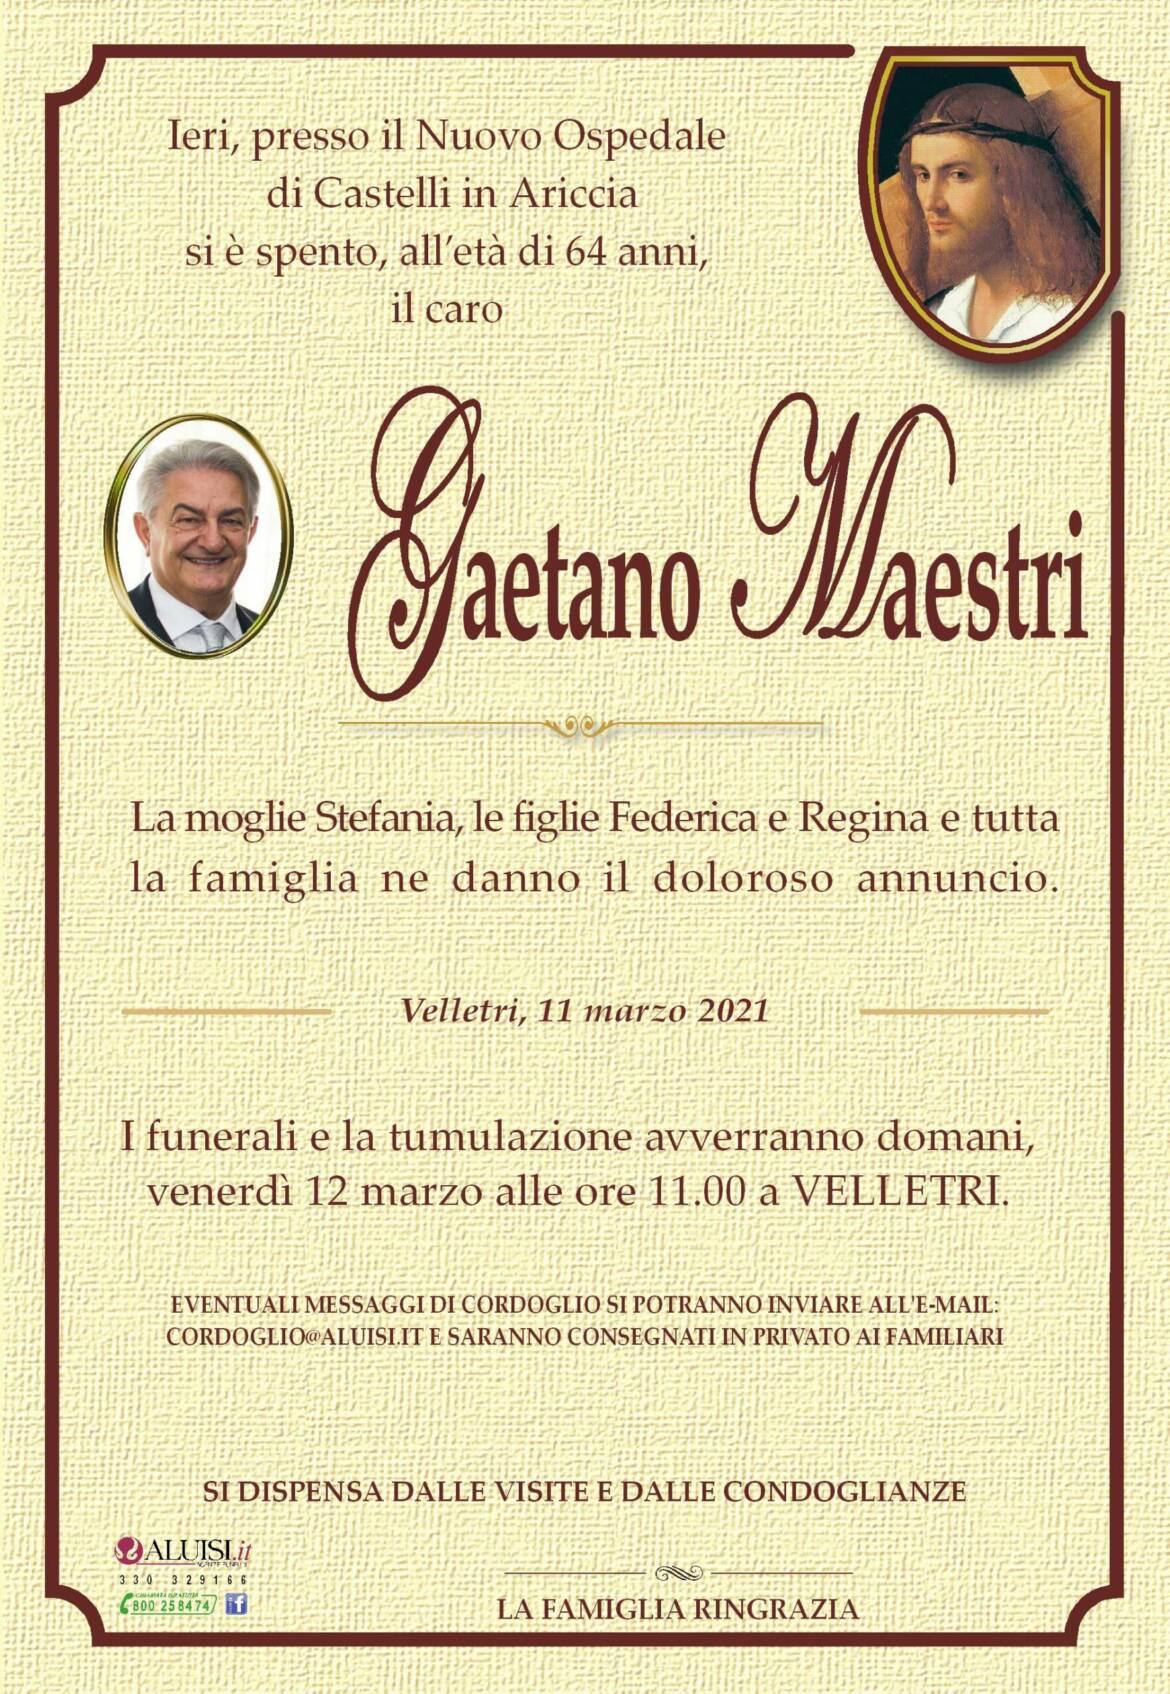 Annuncio-GAETANO-MAESTRI-COLLEPASSO-scaled.jpg